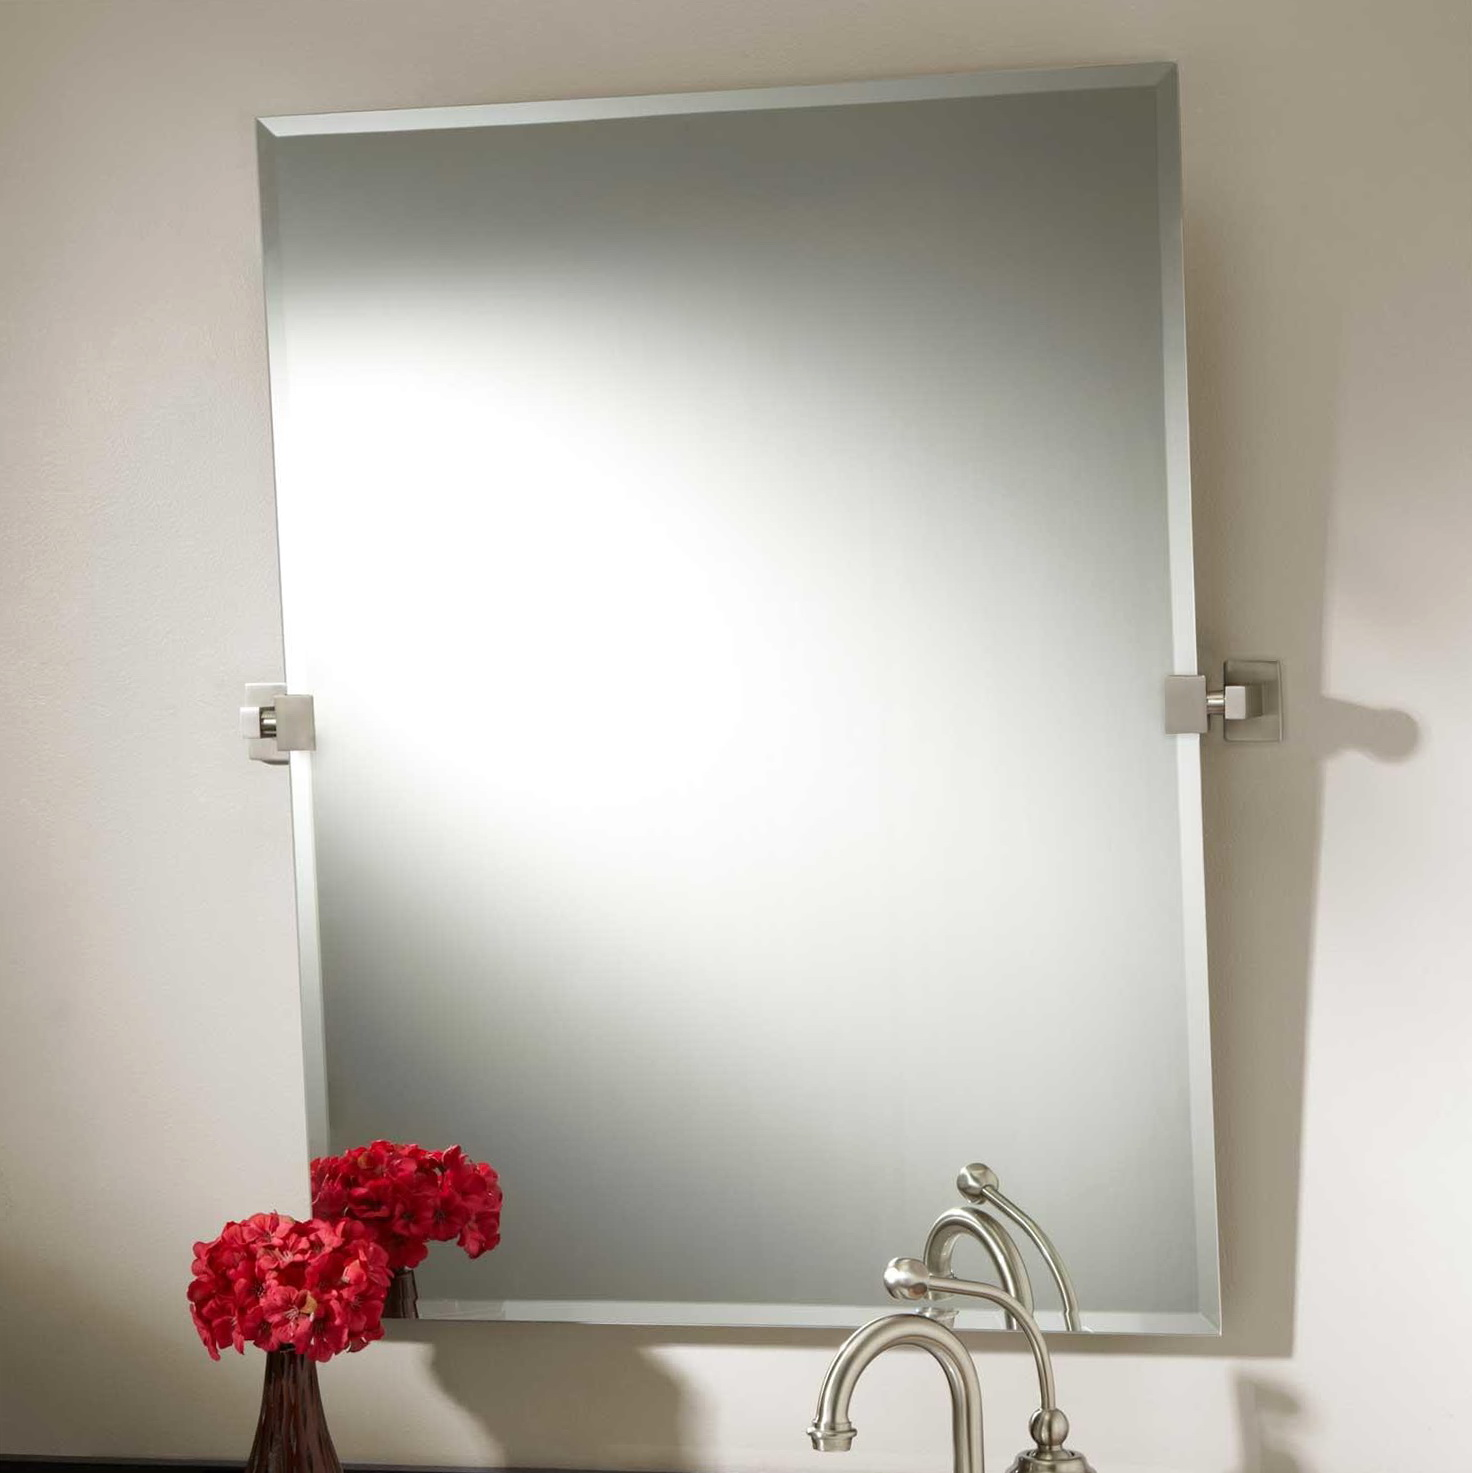 Brushed Nickel Bathroom Mirror Rectangular